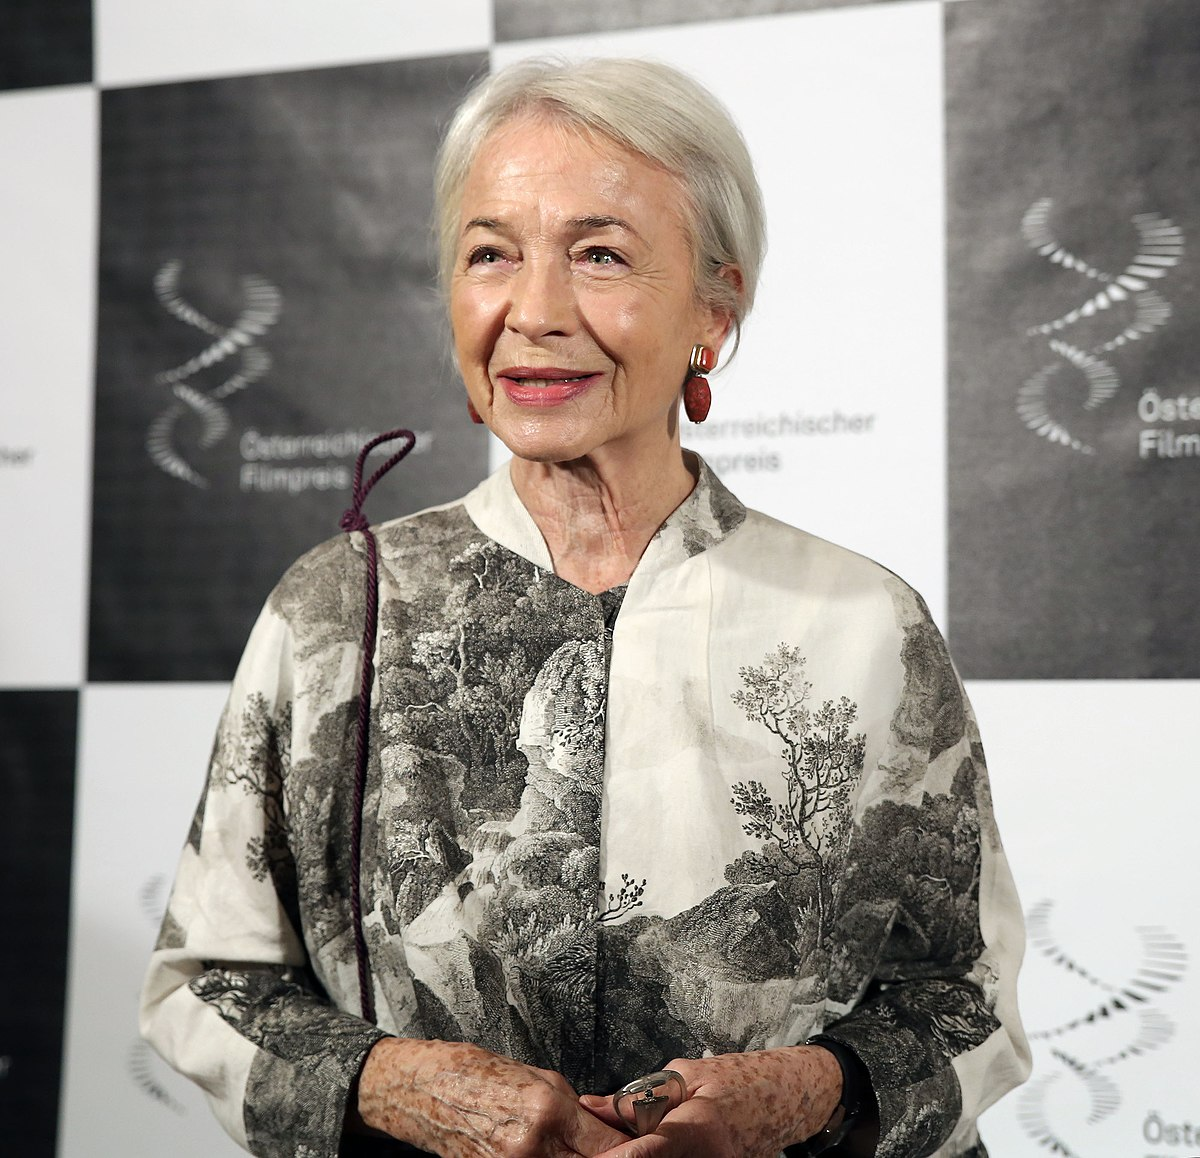 Christine Ostermayer